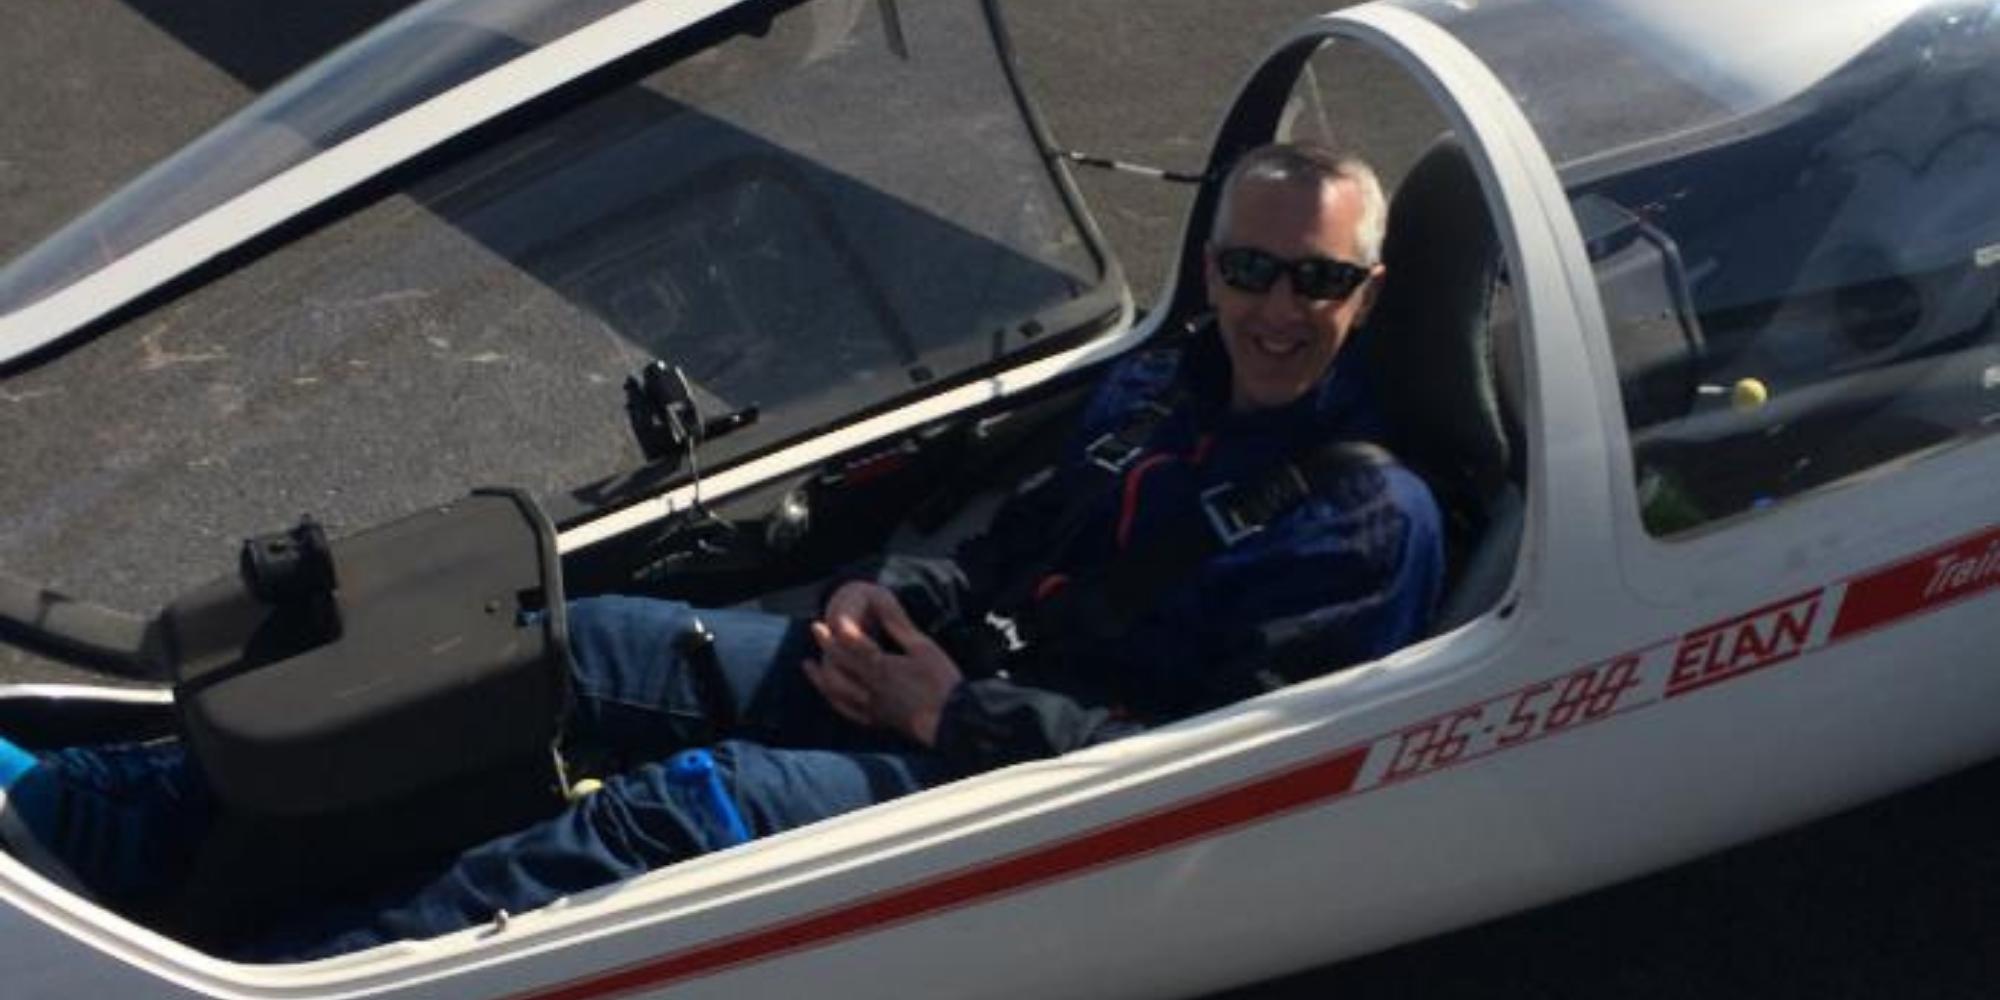 Martin Laitt sitting co-pilot in a D6-500 Air plane.